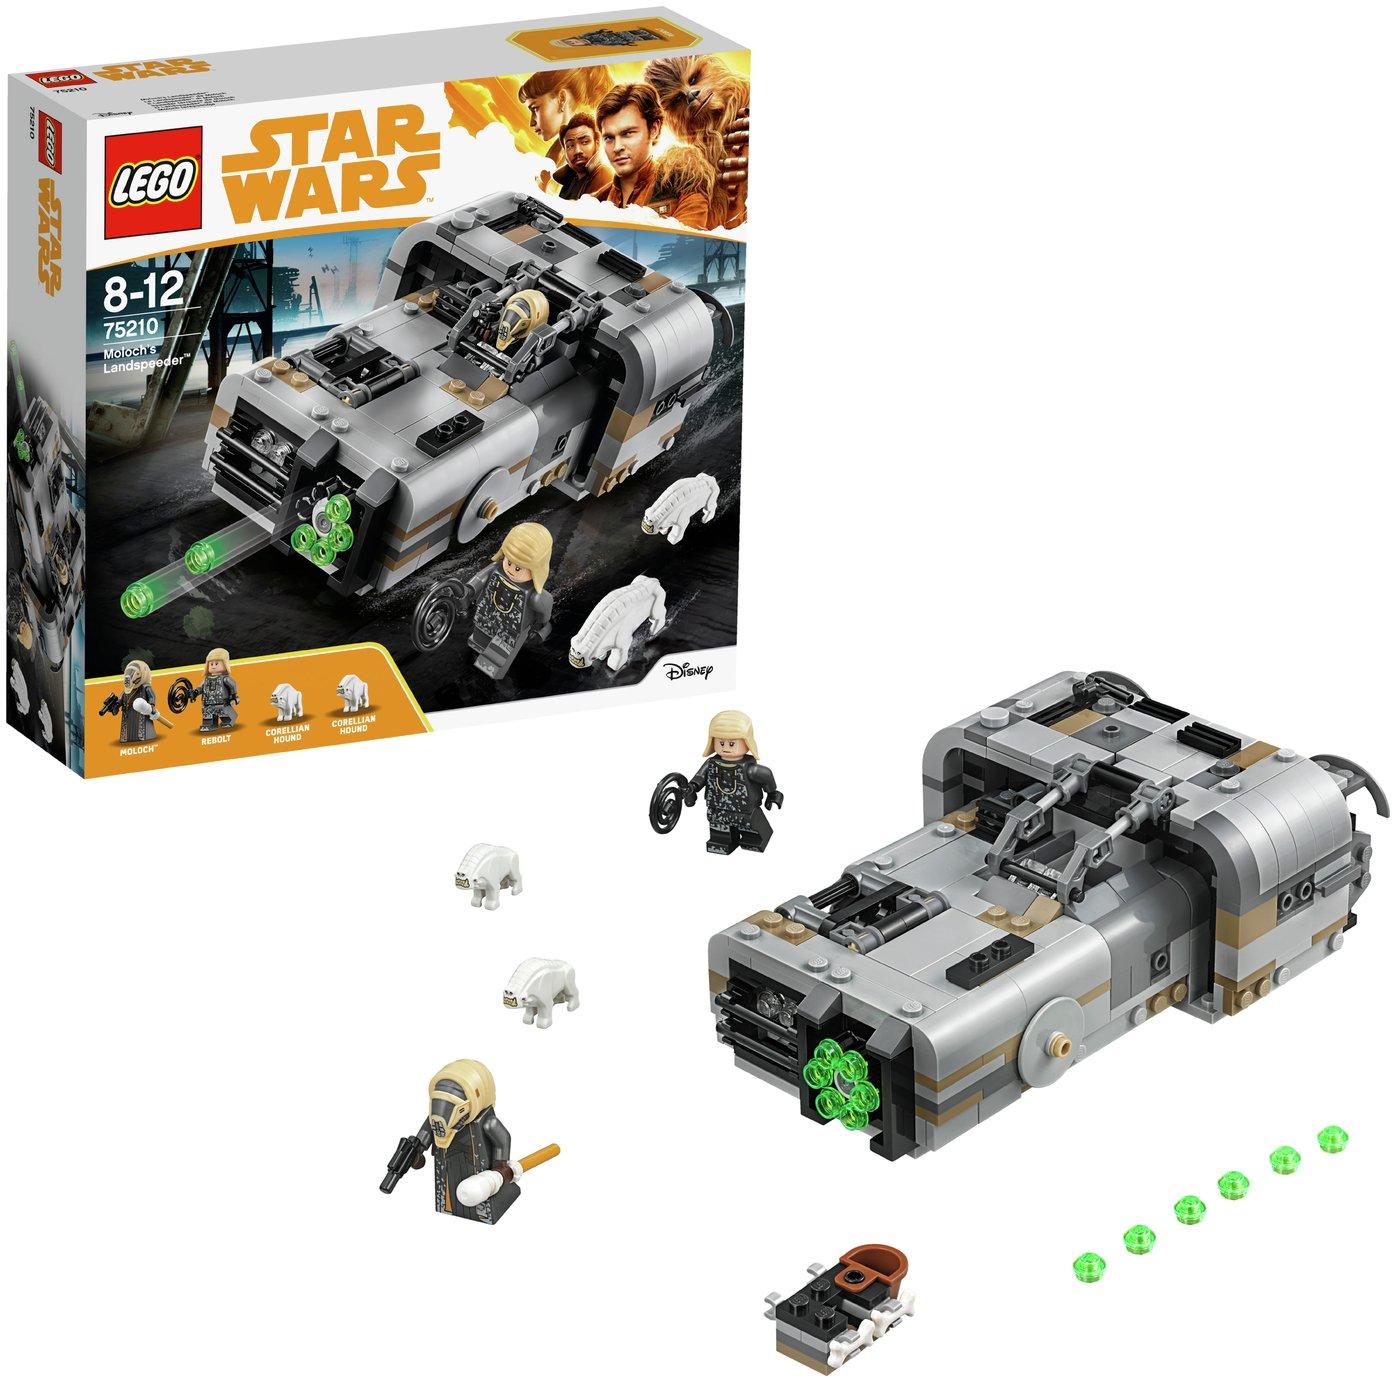 LEGO Star Wars Han Solo Moloch's Landspeeder - 75210